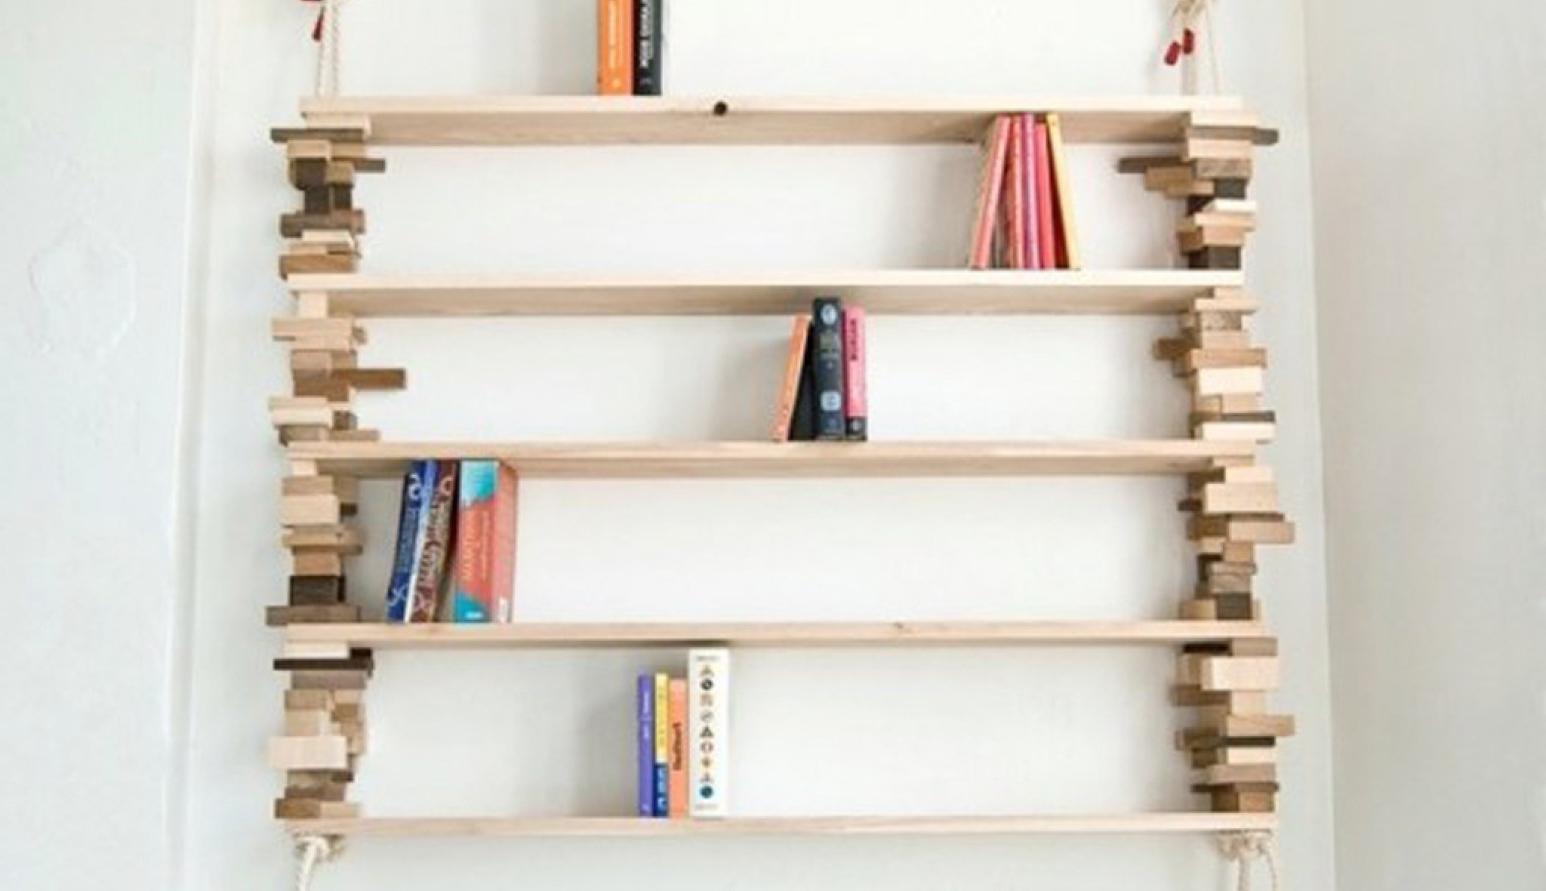 Cheap Bookshelves With Popular Cheap Wall Bookshelves (View 12 of 15)